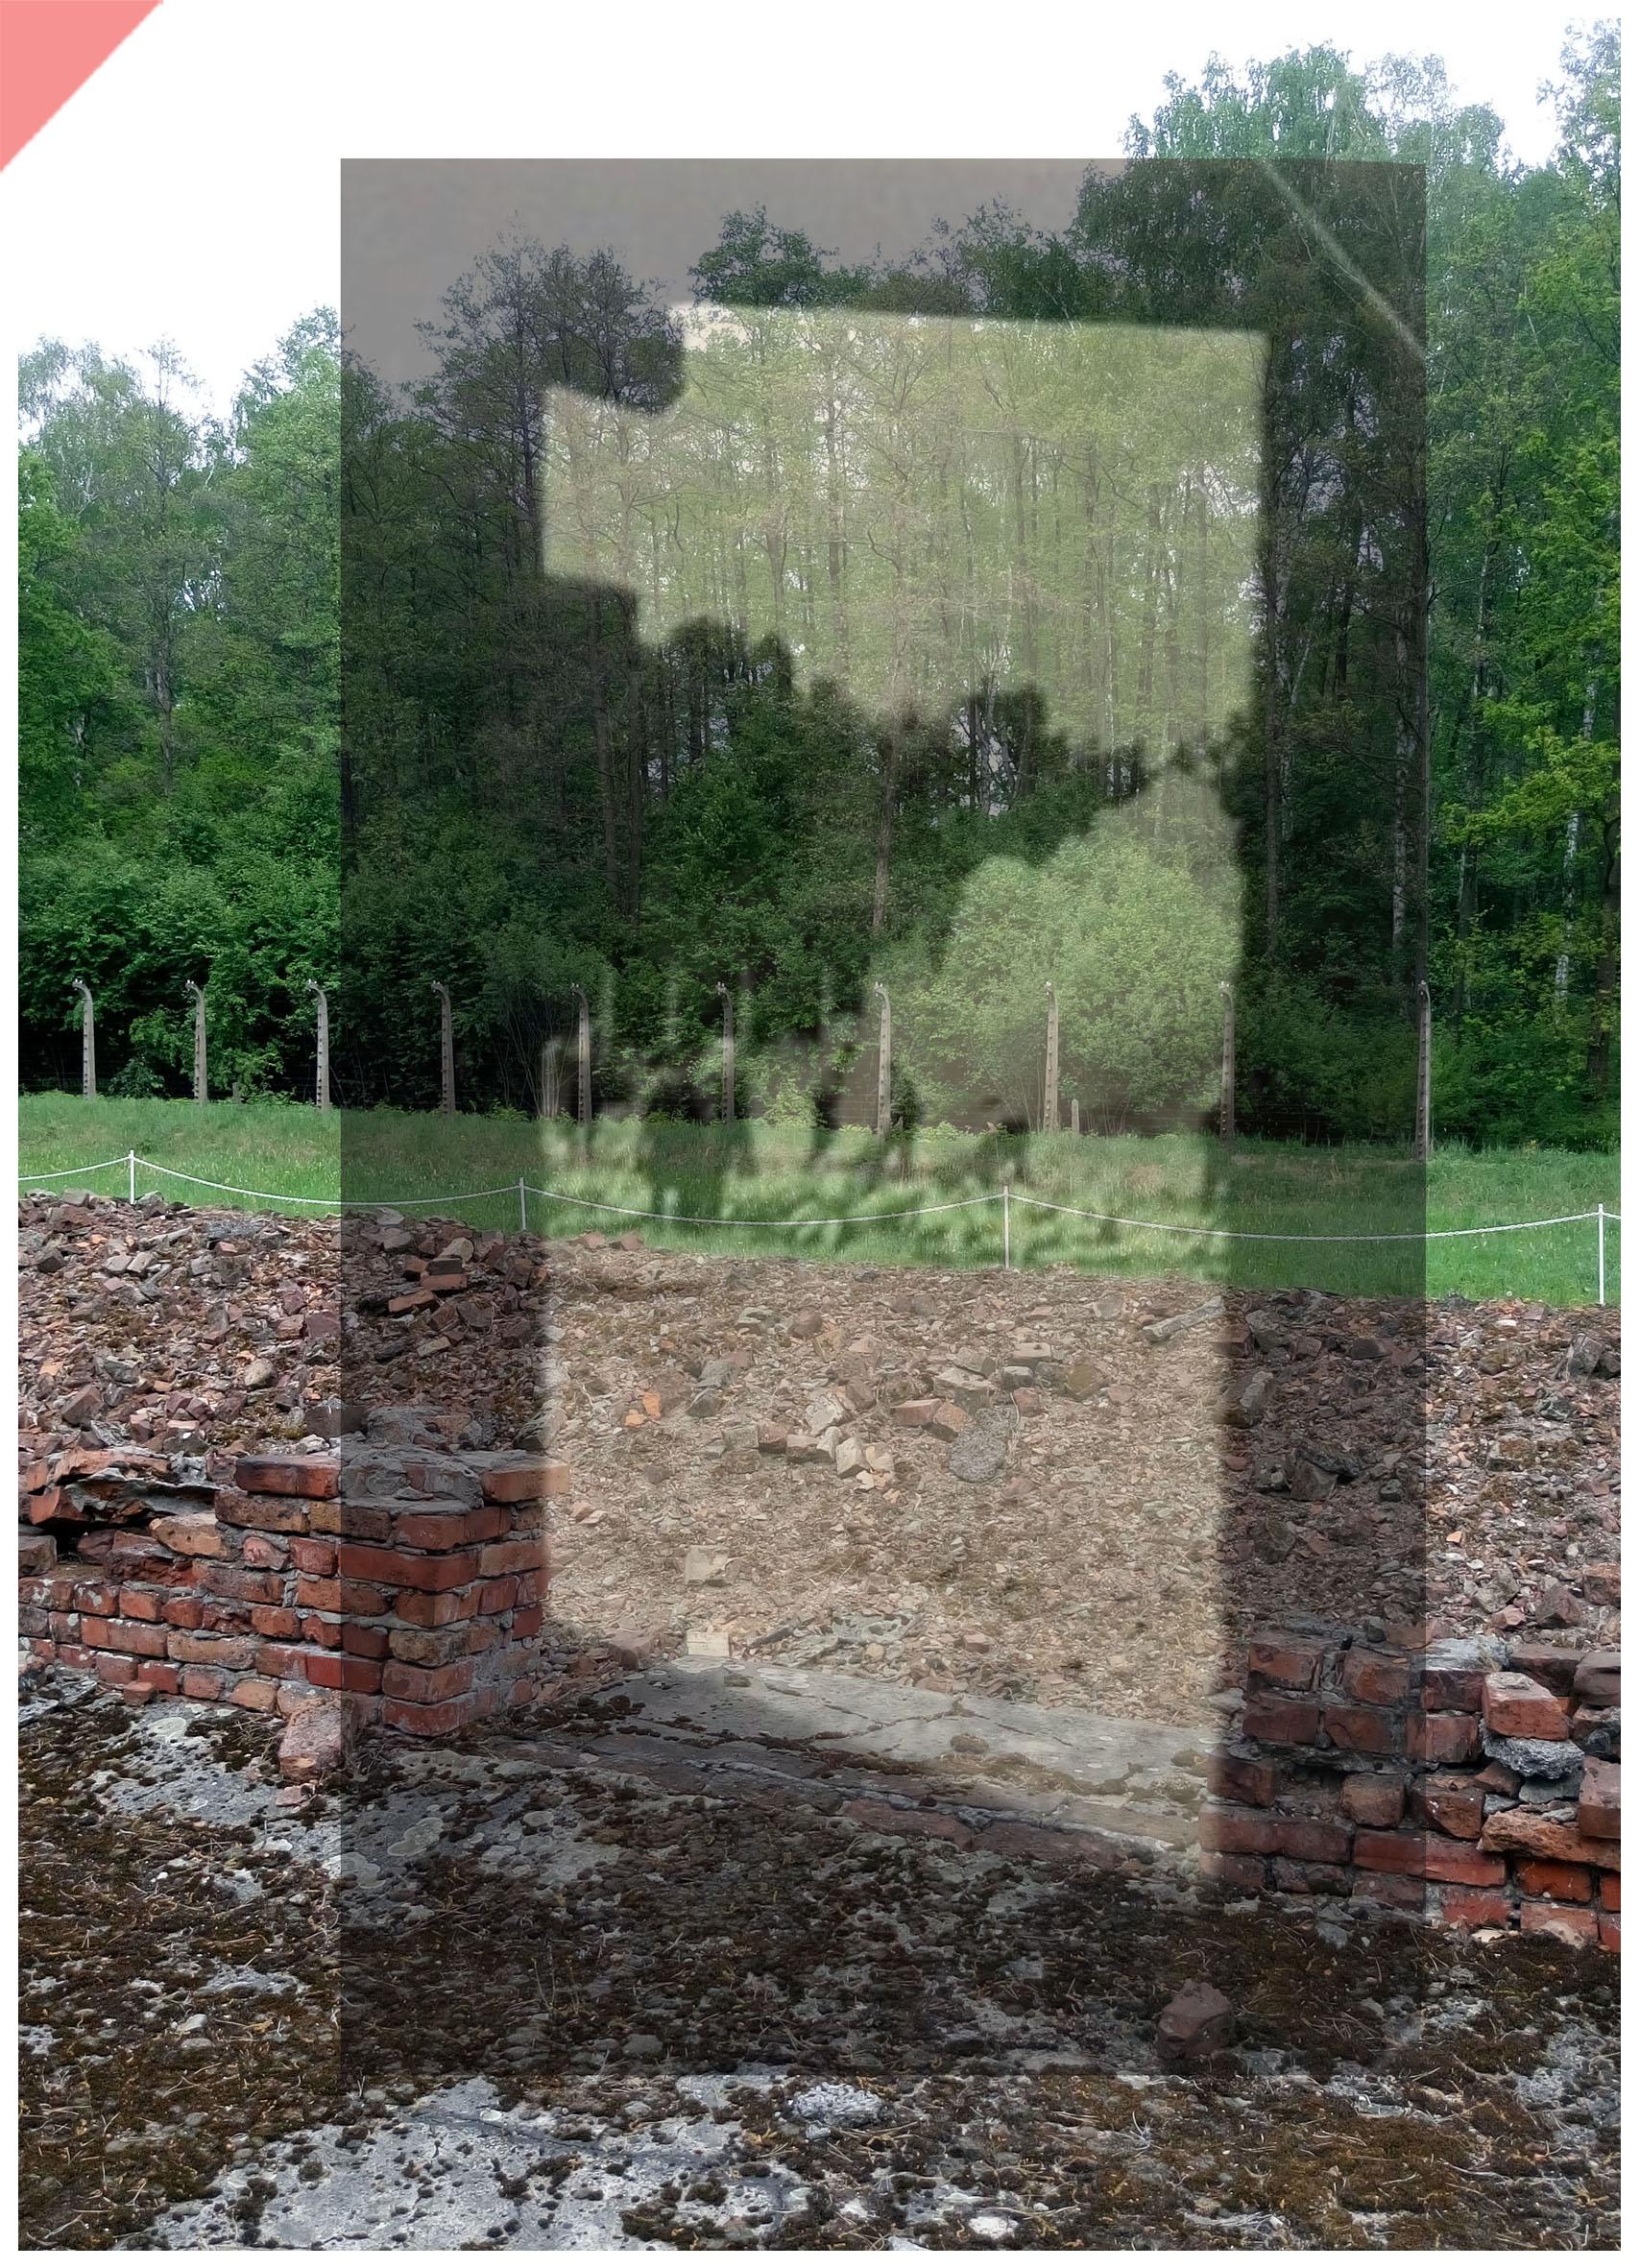 Auschwitz-Birkenau-Krematorium-5-V-superimpose-Hungaria-now-then-1943-1944-Photo